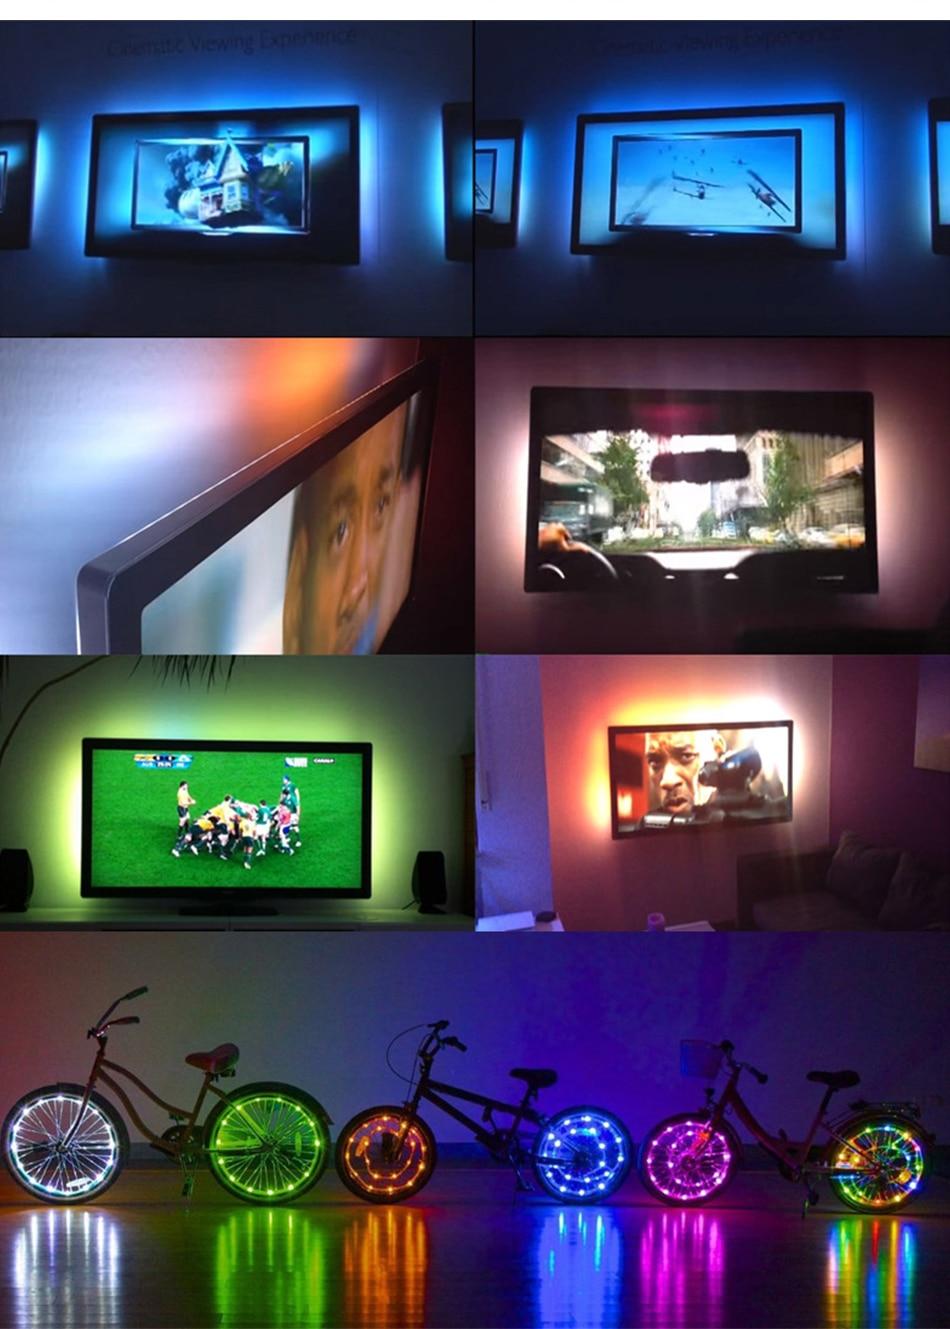 HTB1IskYX6zuK1RjSspeq6ziHVXaG USB LED Strip DC 5V Flexible Light Lamp 60LEDs SMD 2835 50CM 1M 2M 3M 4M 5M Mini 3Key Desktop Decor Tape TV Background Lighting